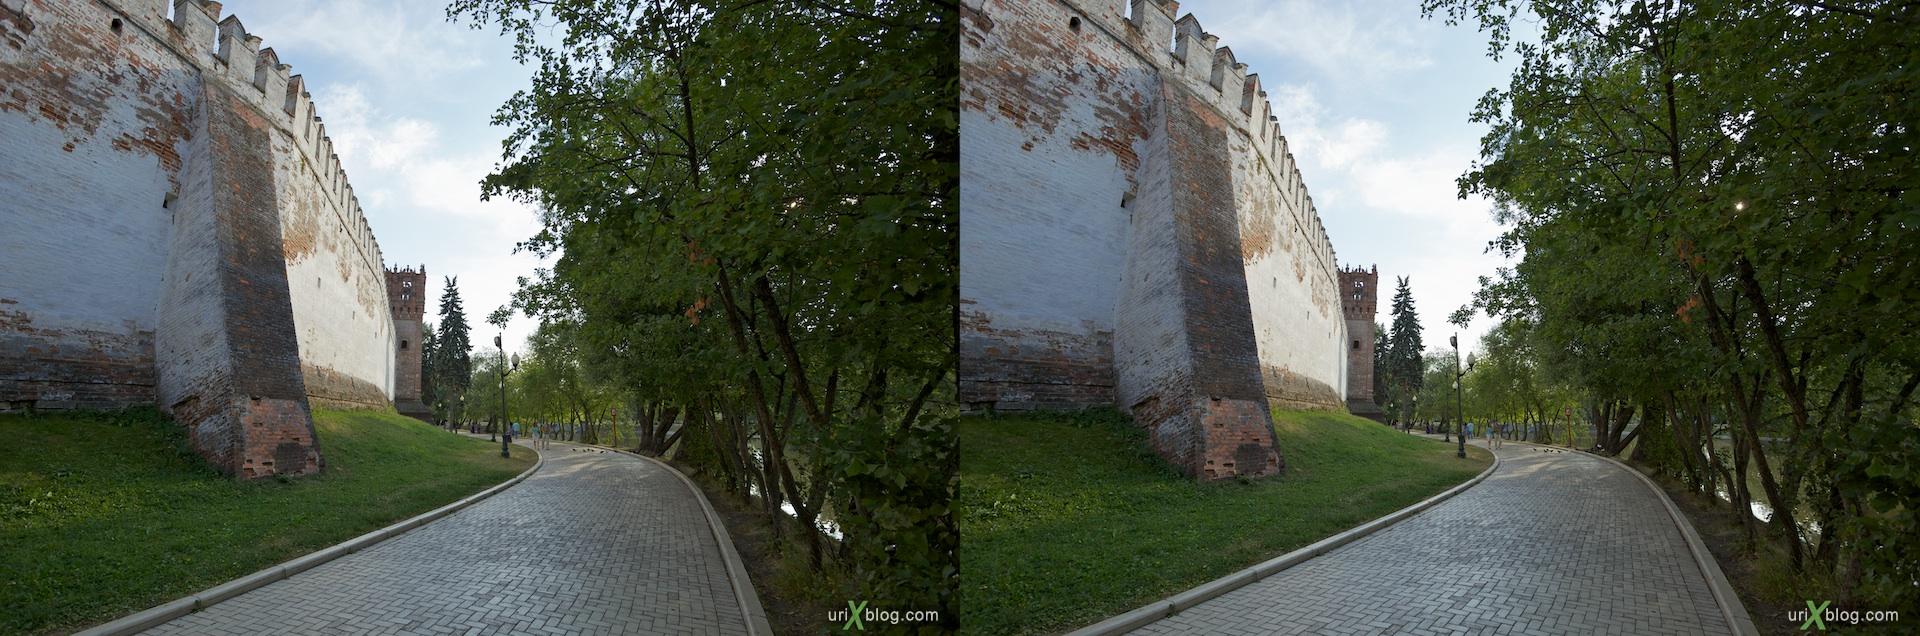 3D, stereo, cross-eyed, стерео, стереопара Новодевичий монастырь Москва Novodevichiy monastyr Moscow